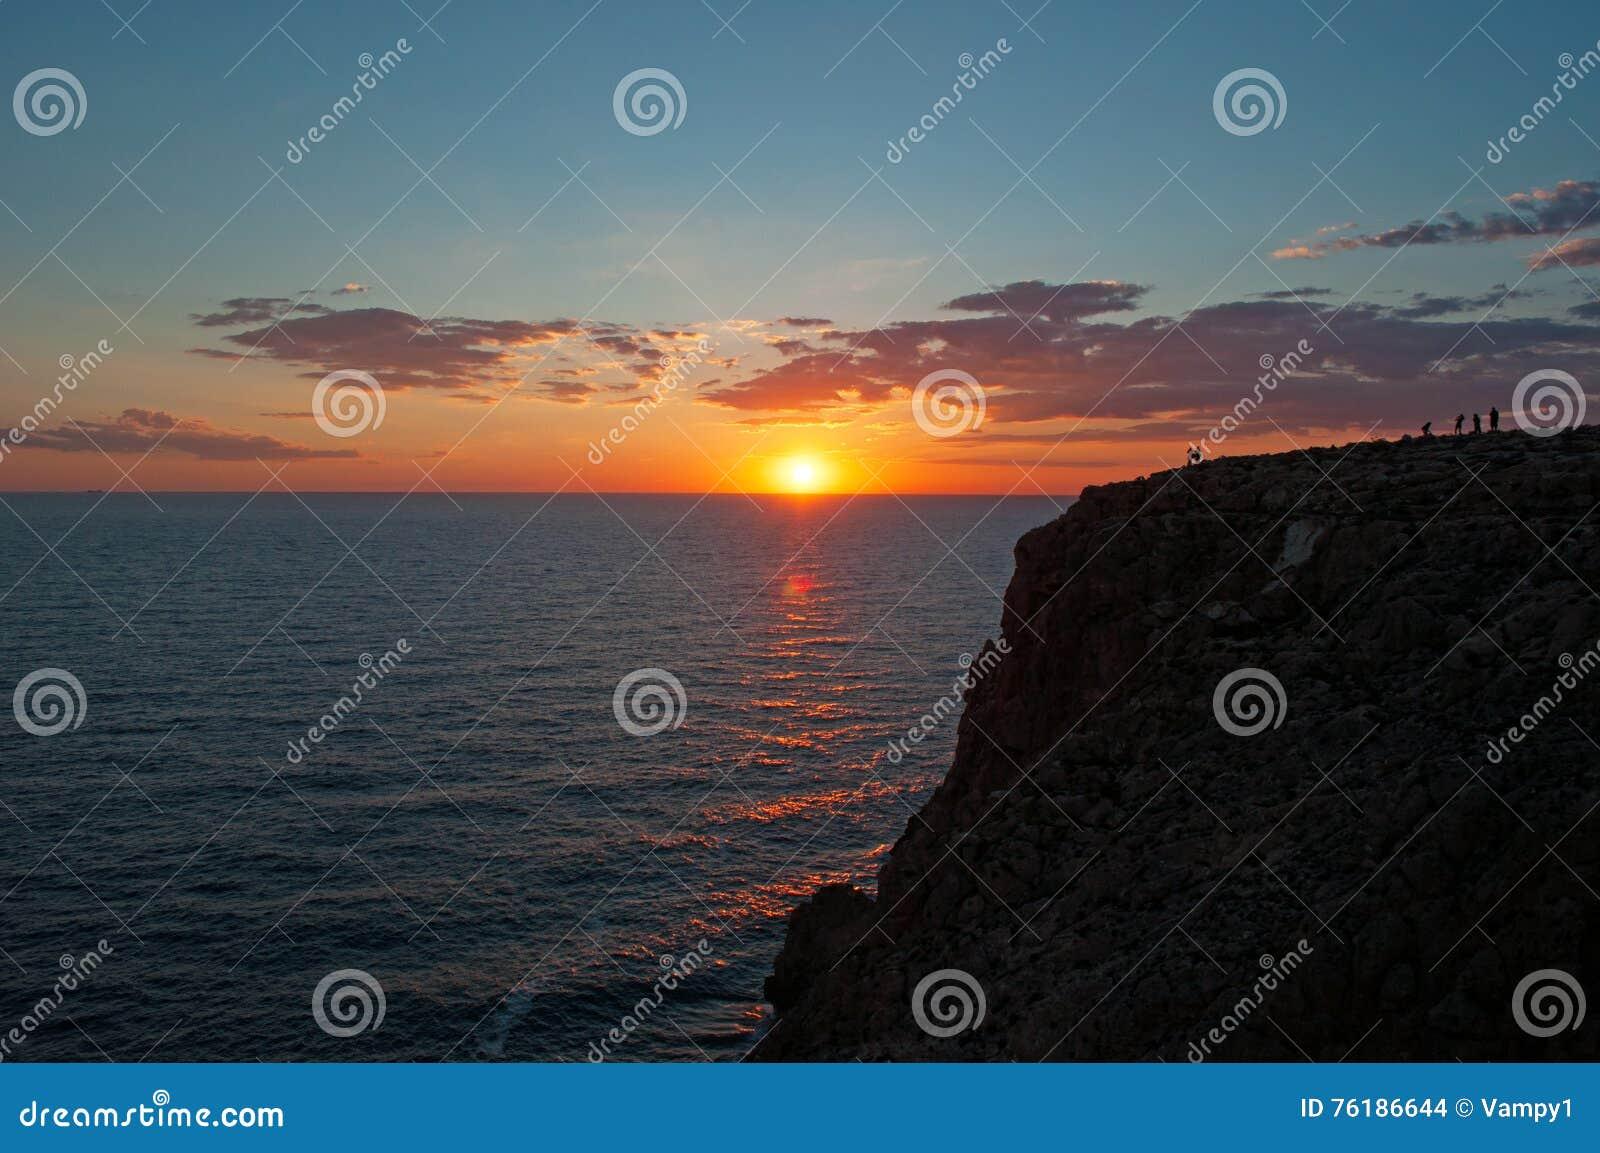 Formentera, Balearic Islands, Spain, Europe, sunset, cliff, Cap de Barbaria, sunset point, Mediterranean Sea, nature, landscape